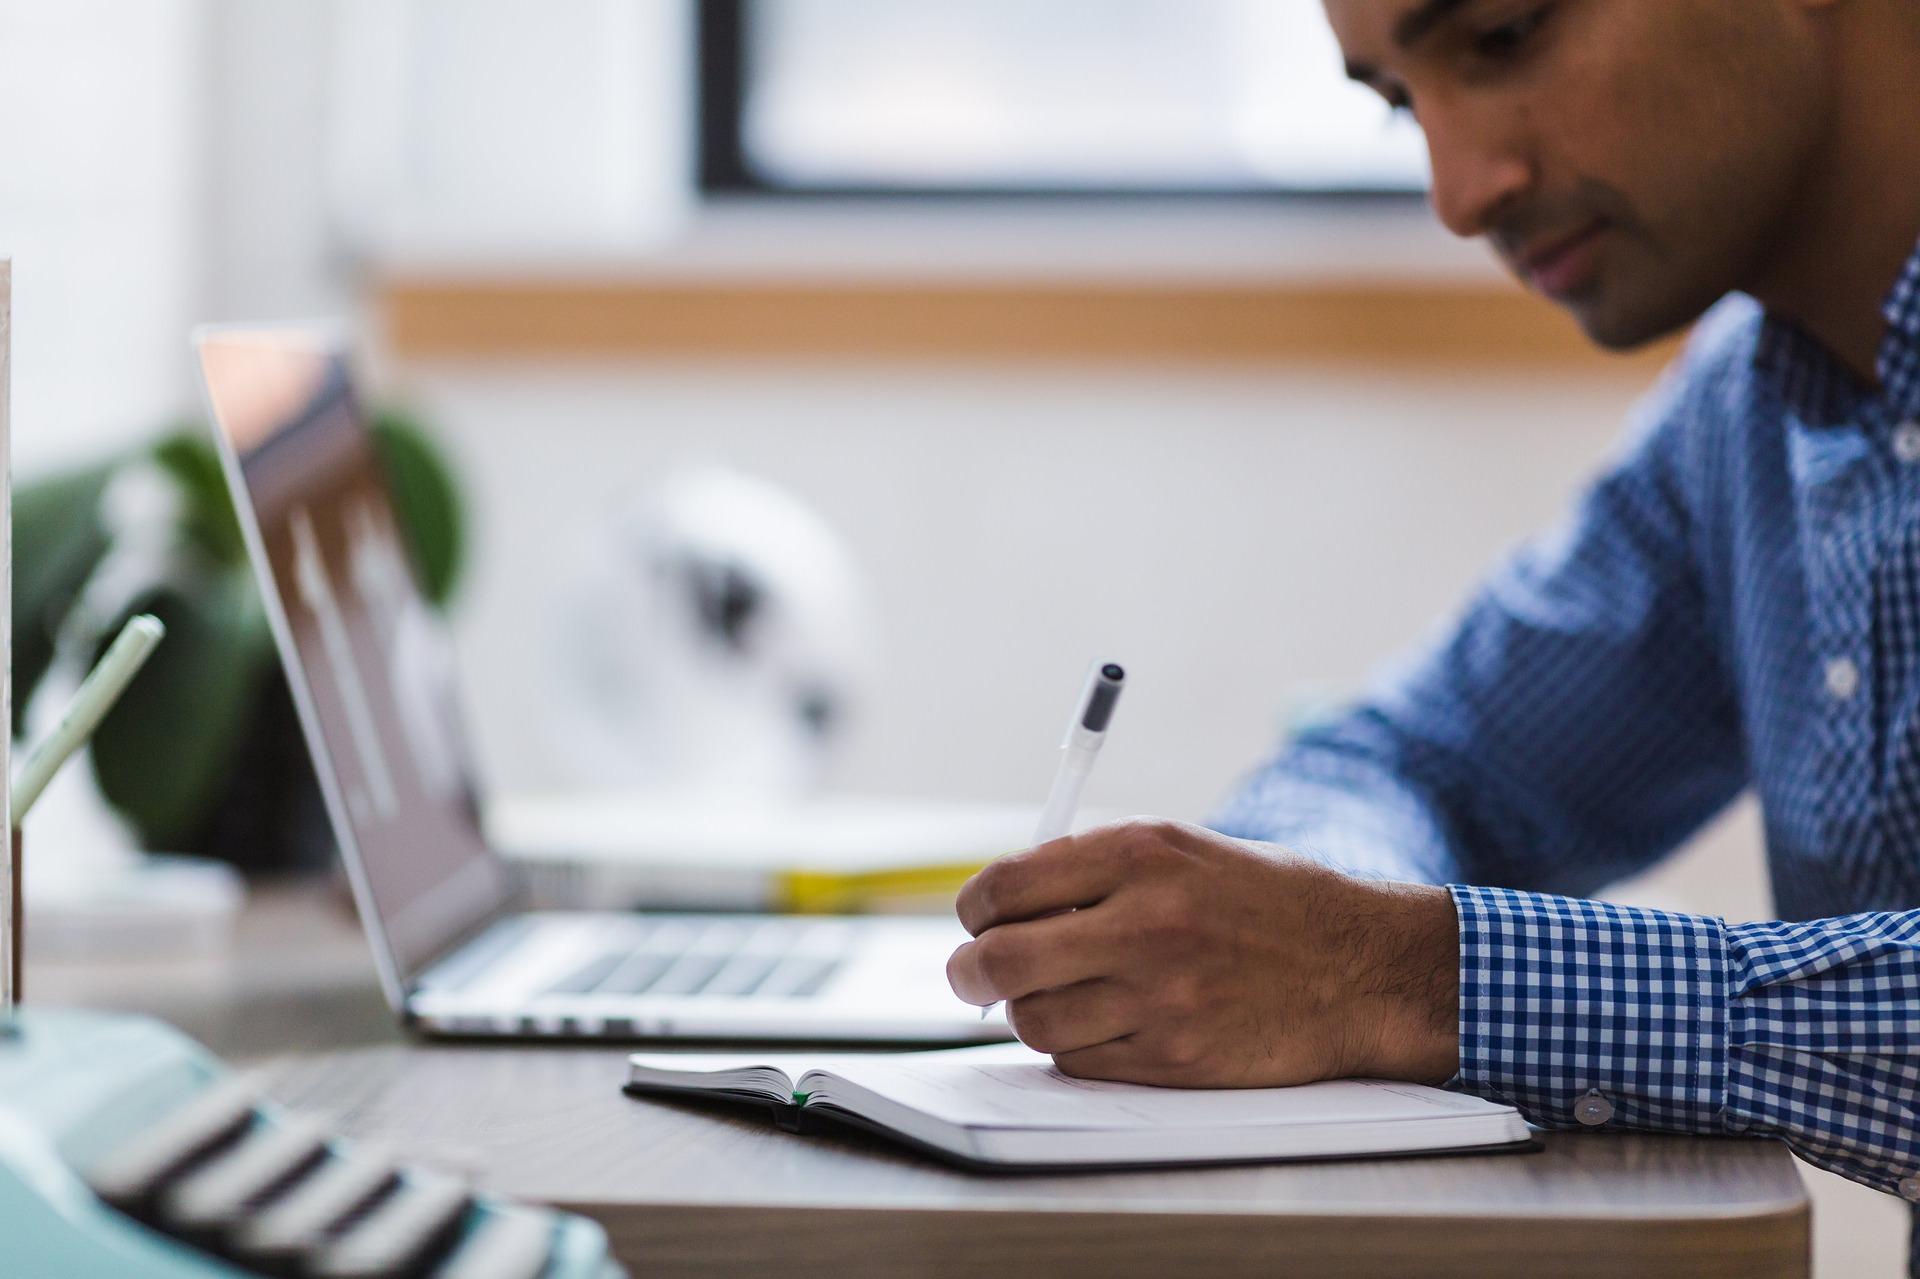 DevTel Employee Taking Notes